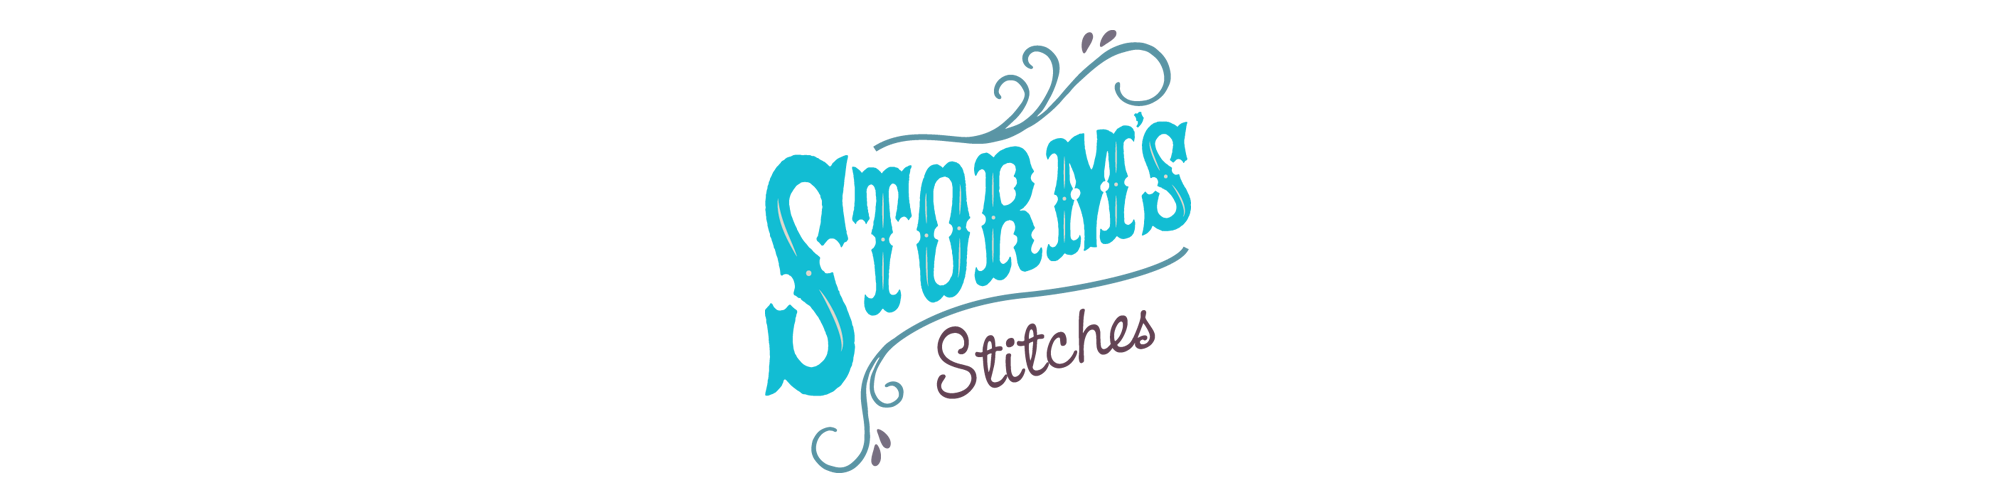 Storm's Stitches